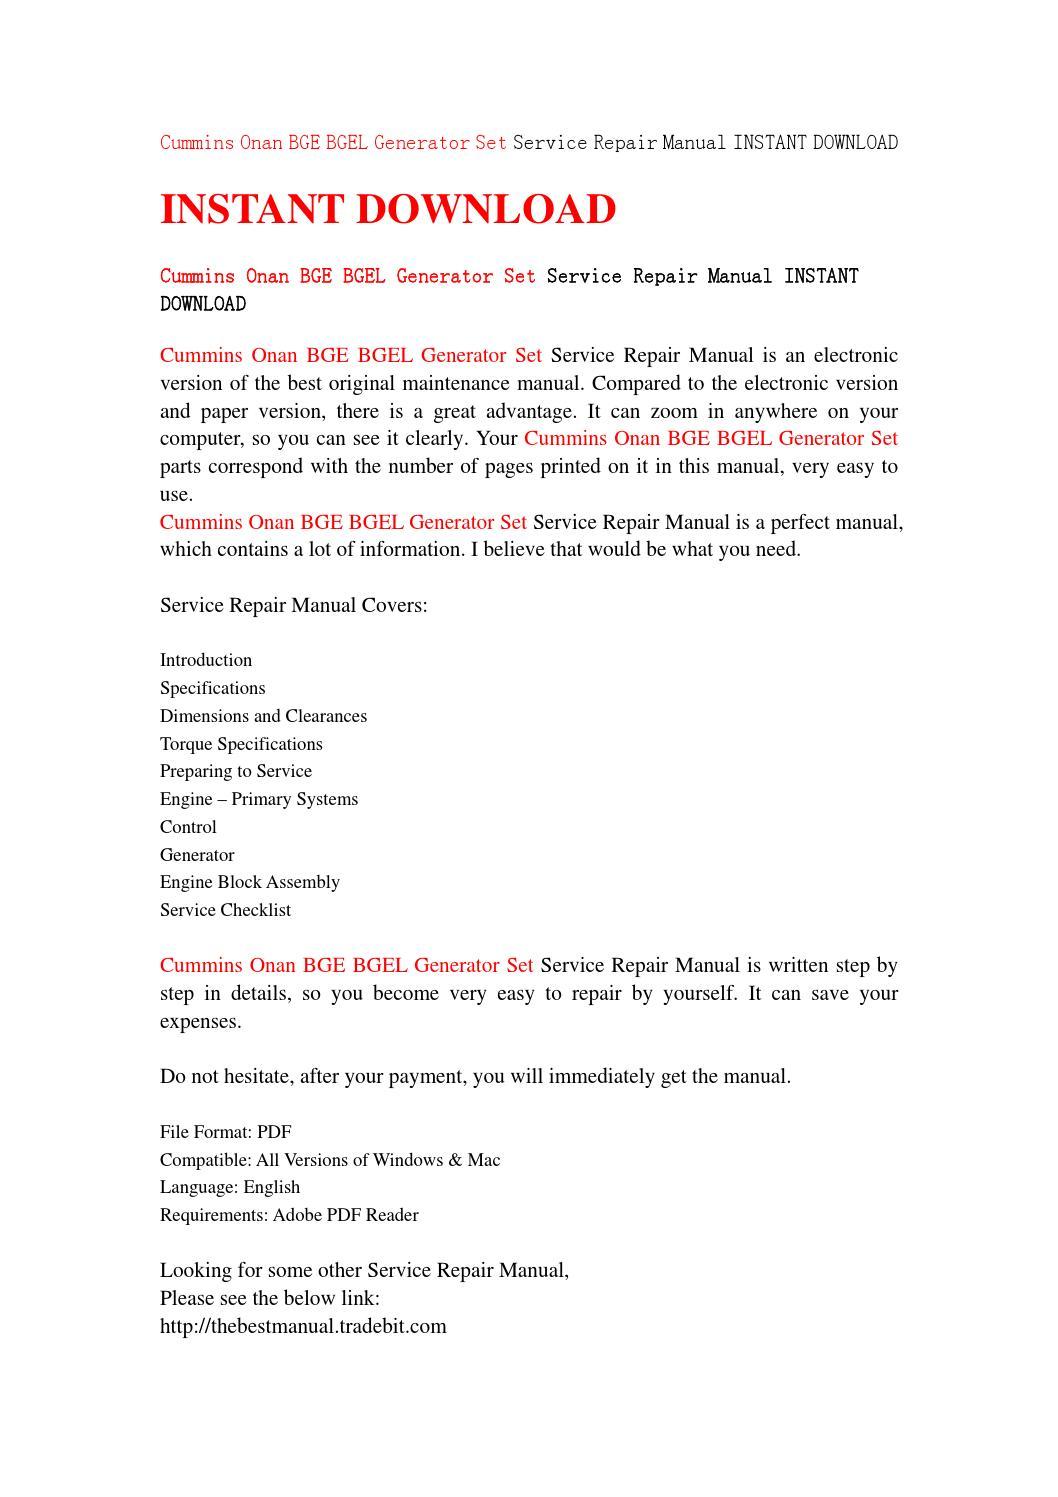 Cummins onan bge bgel generator set service repair manual instant download  by uhshefjnsne - issuu